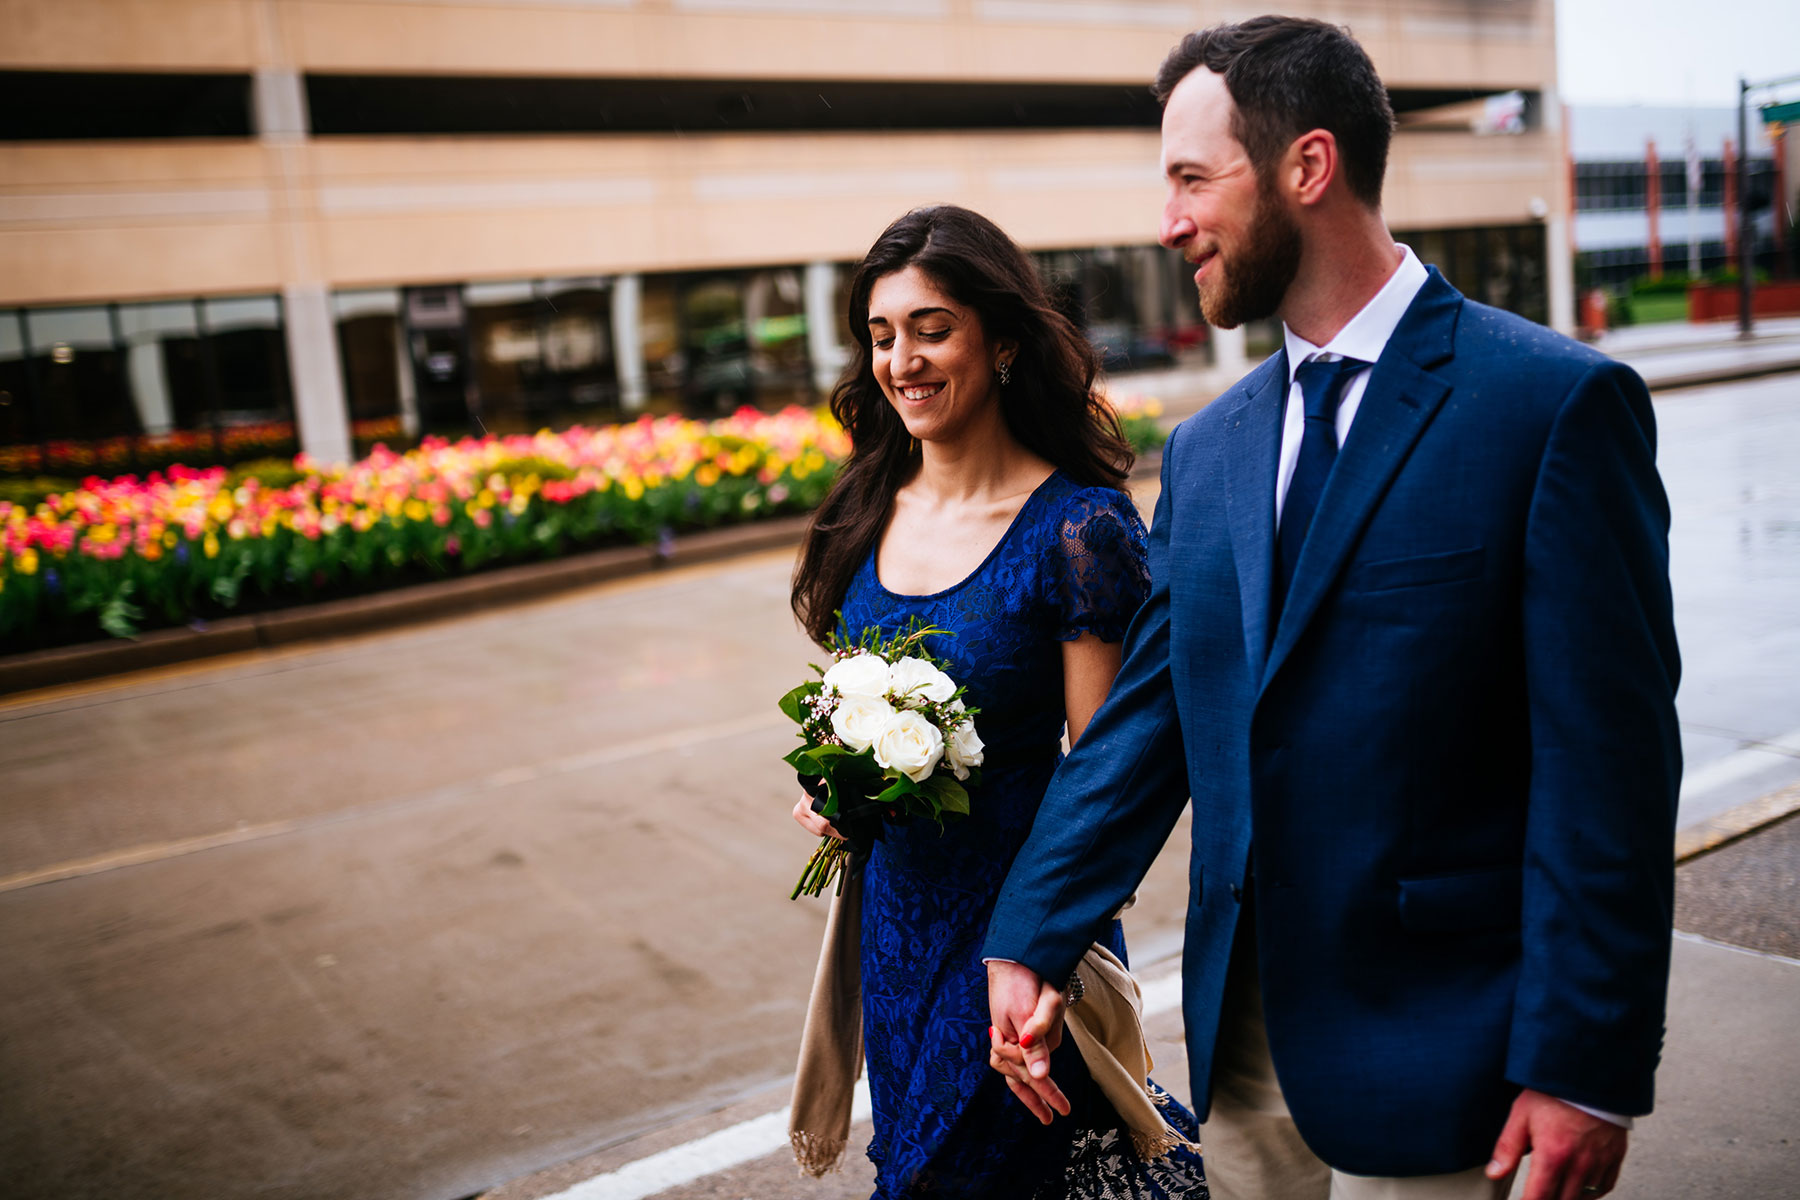 couple walking after wedding